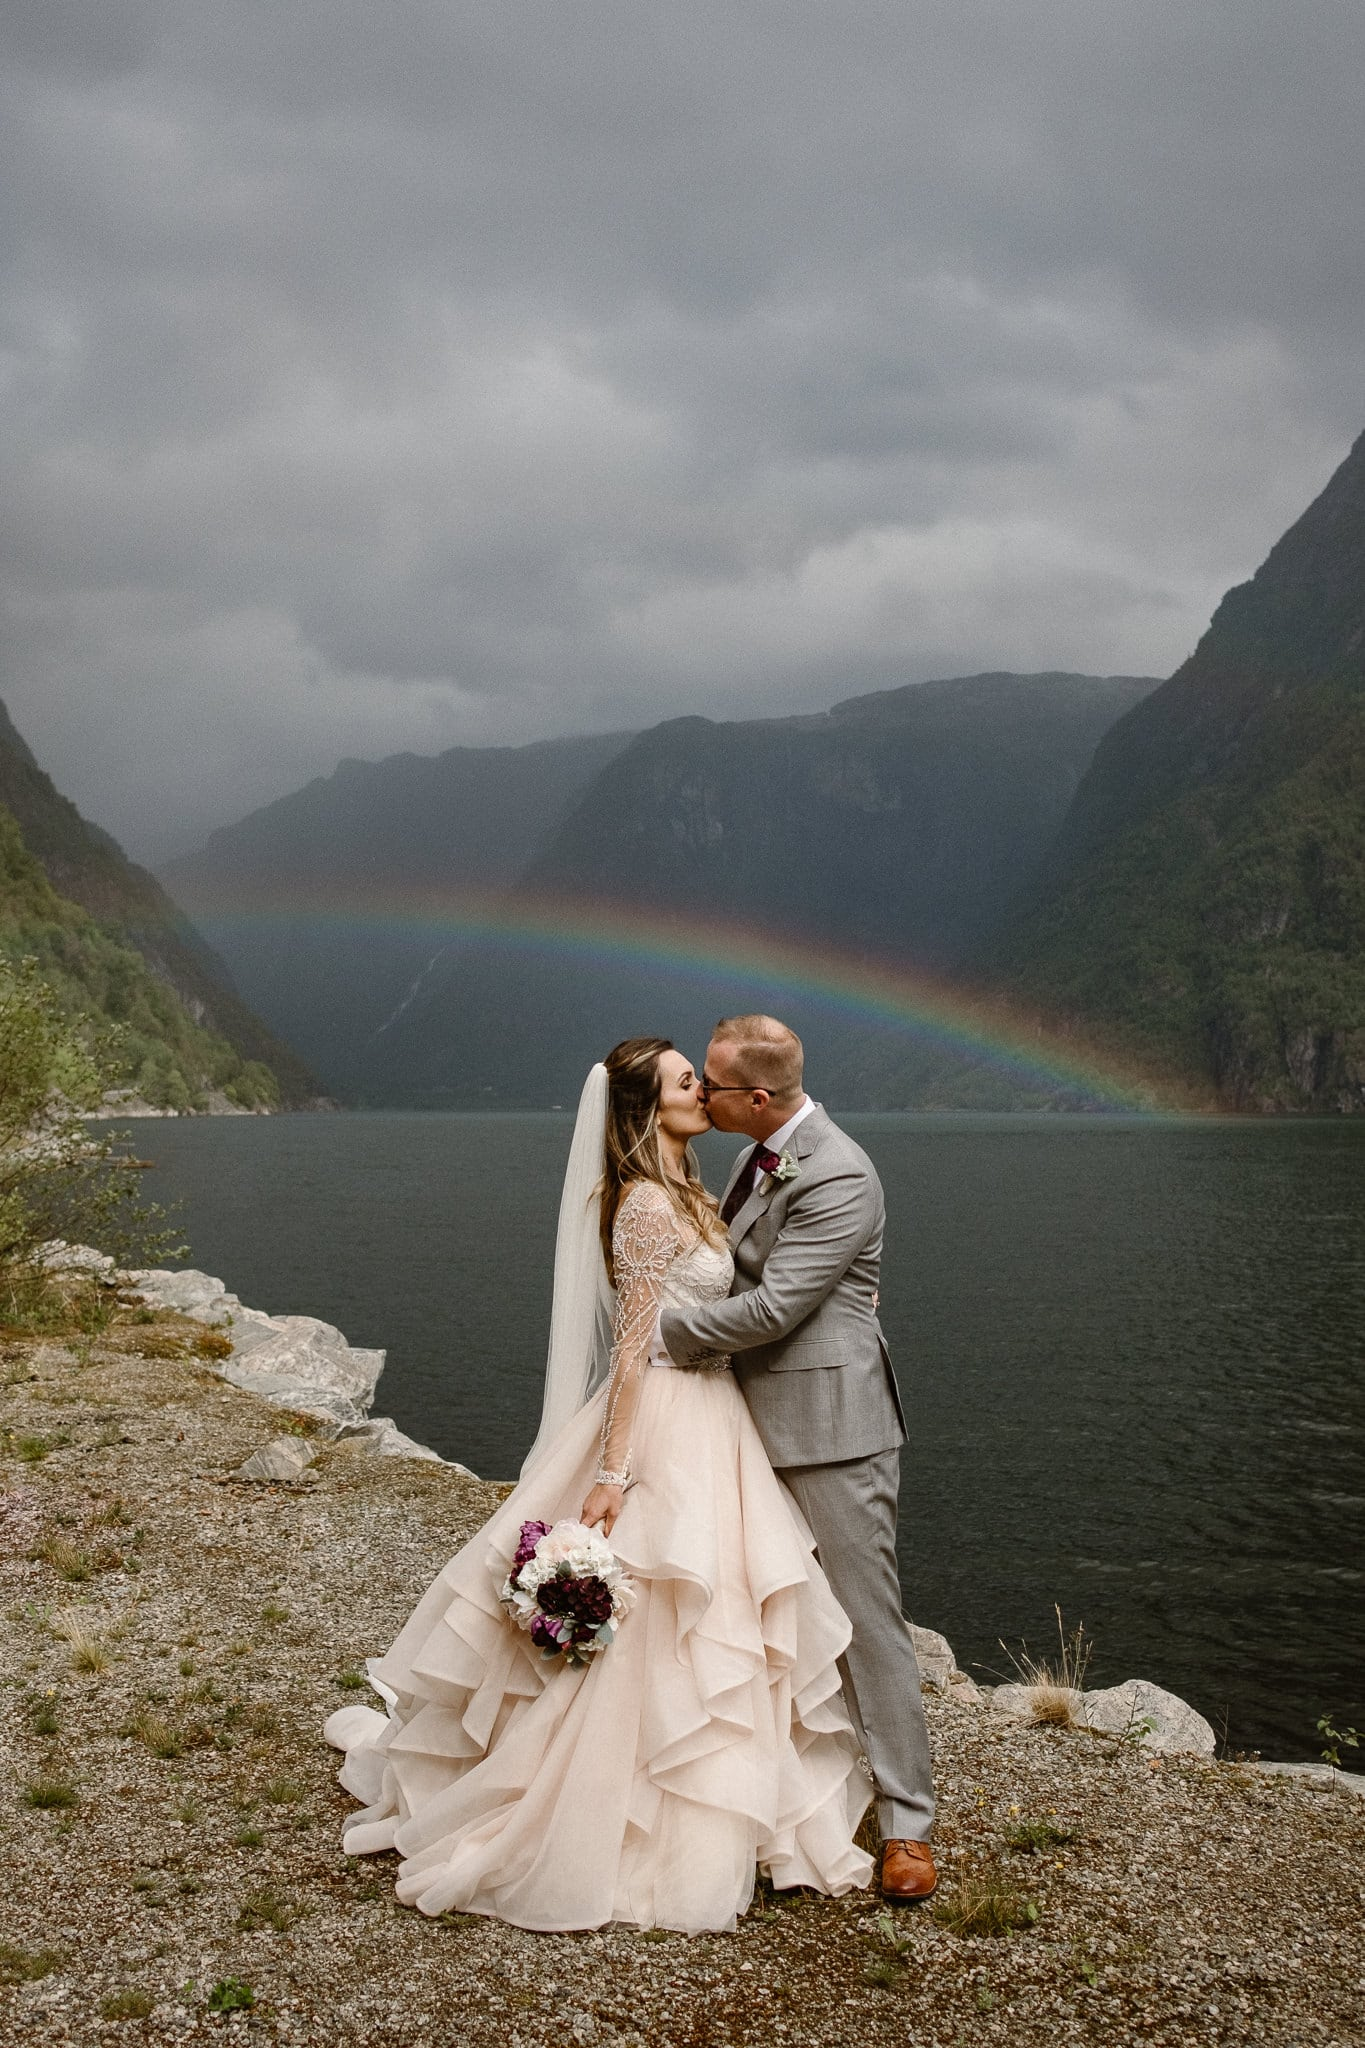 Norway destination wedding photographer, Hardangerfjord bryllup, norsk bryllupsfotograf, Bergen fjord elopement photographer, bride and groom kissing under rainbow in fjord, bryllupsfotograf